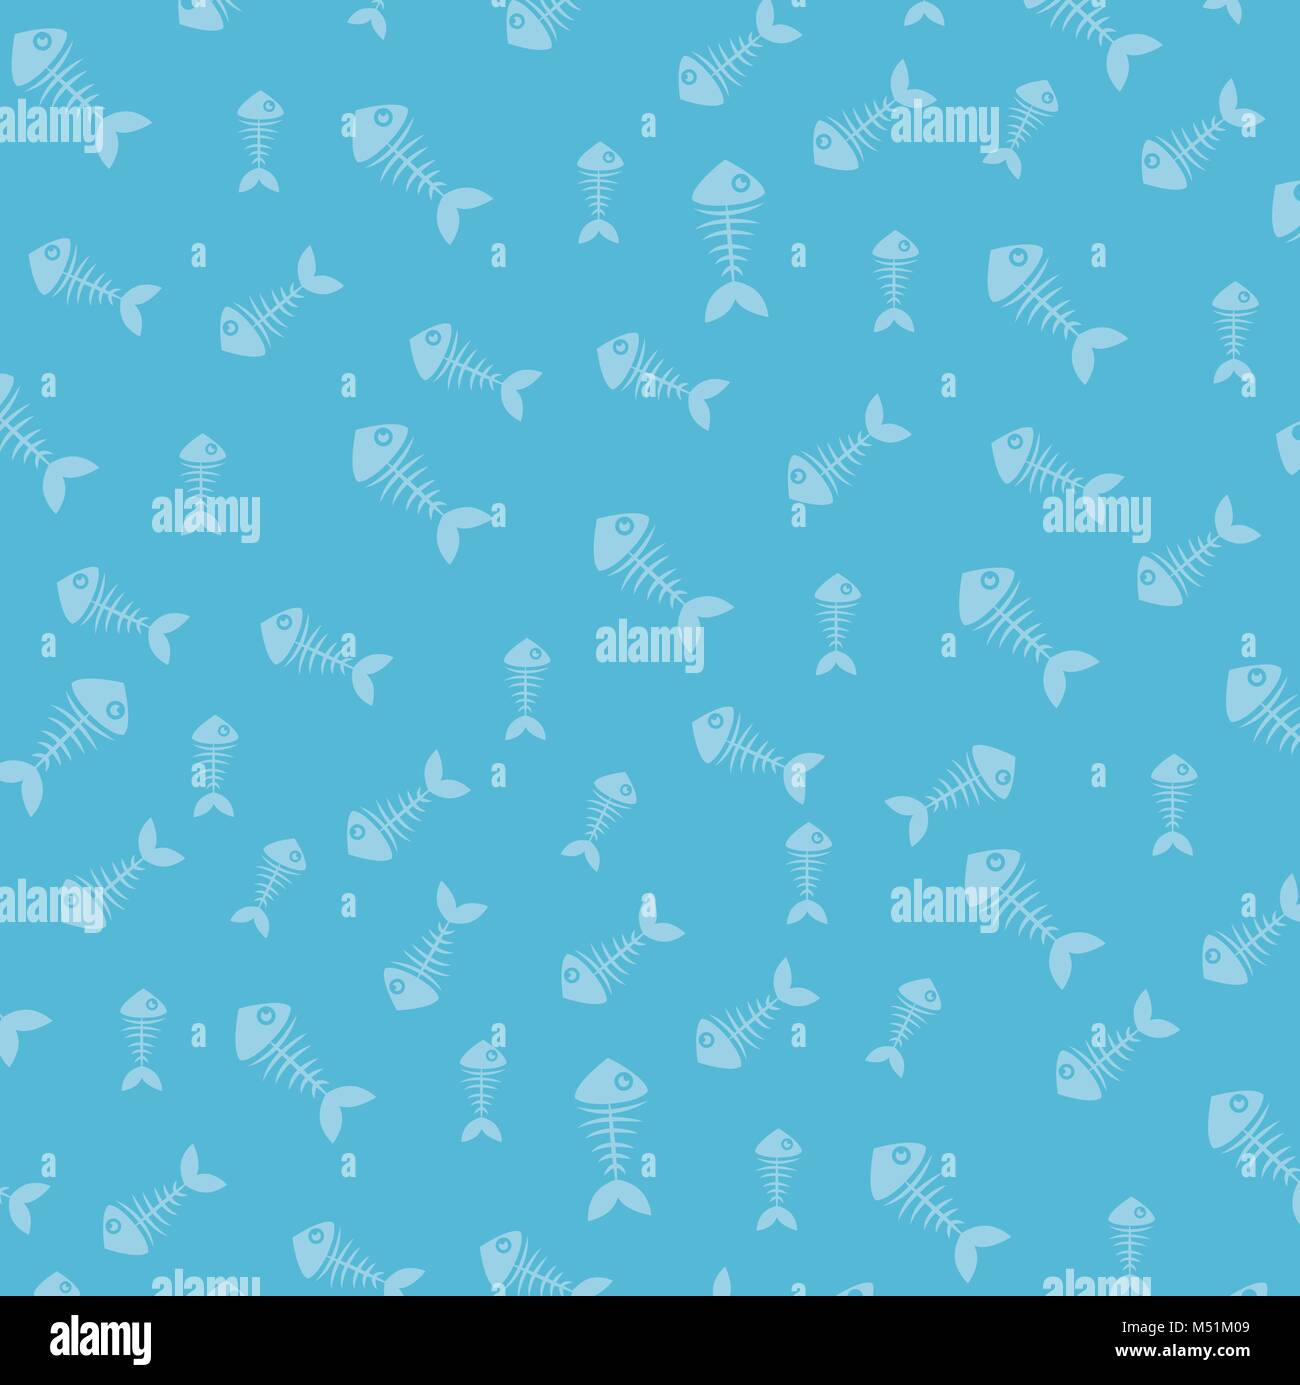 fish bones pattern background - Stock Image